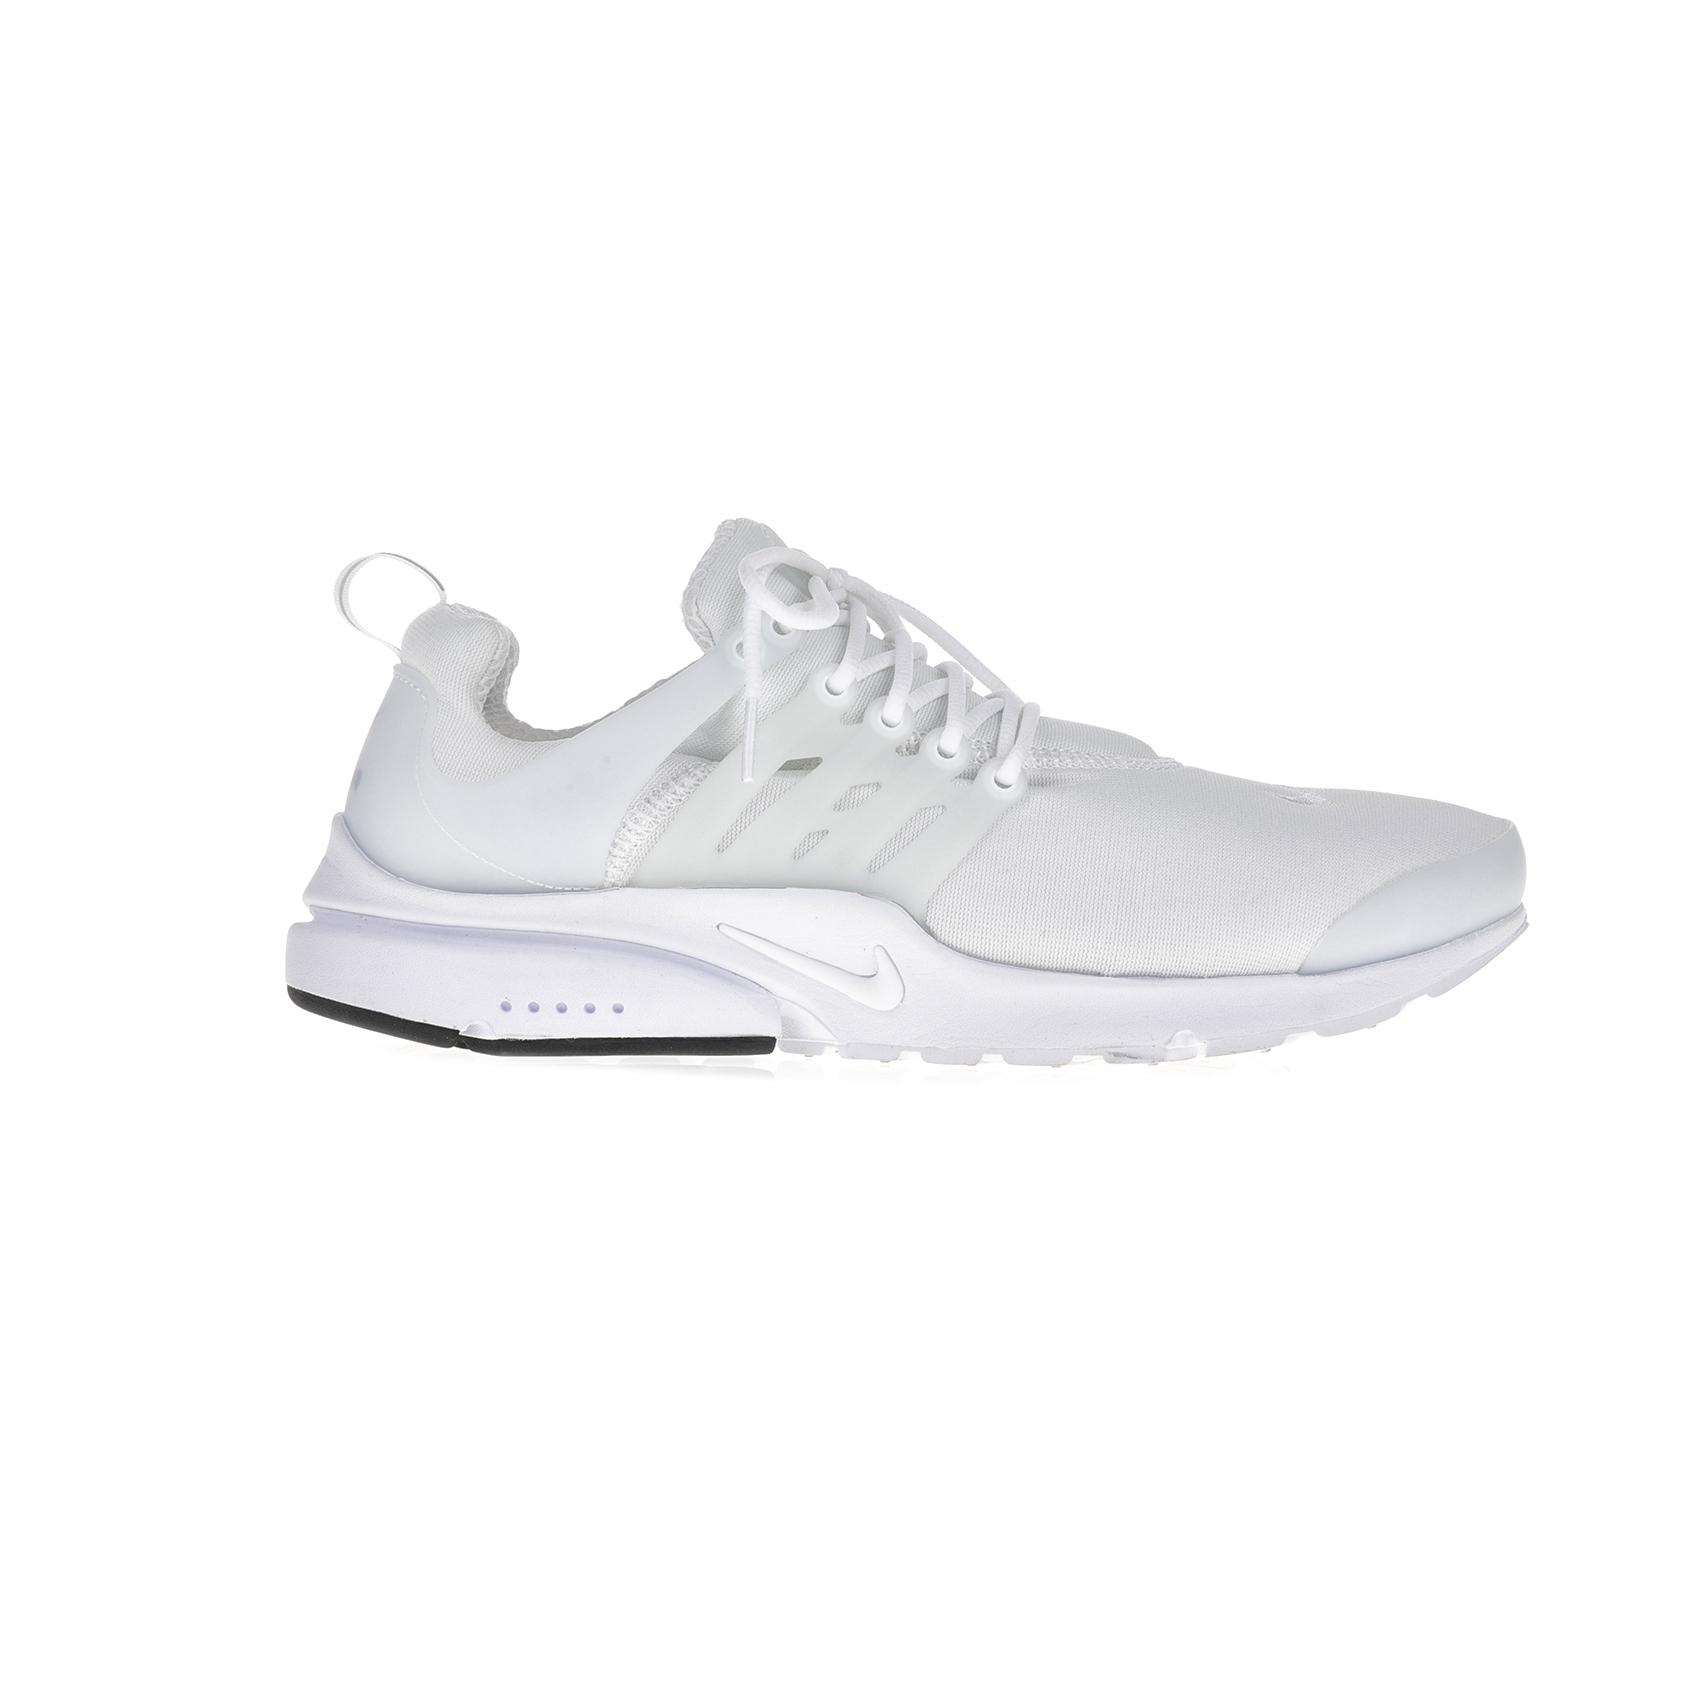 NIKE – Ανδρικά αθλητικά παπούτσια Nike AIR PRESTO ESSENTIAL λευκά